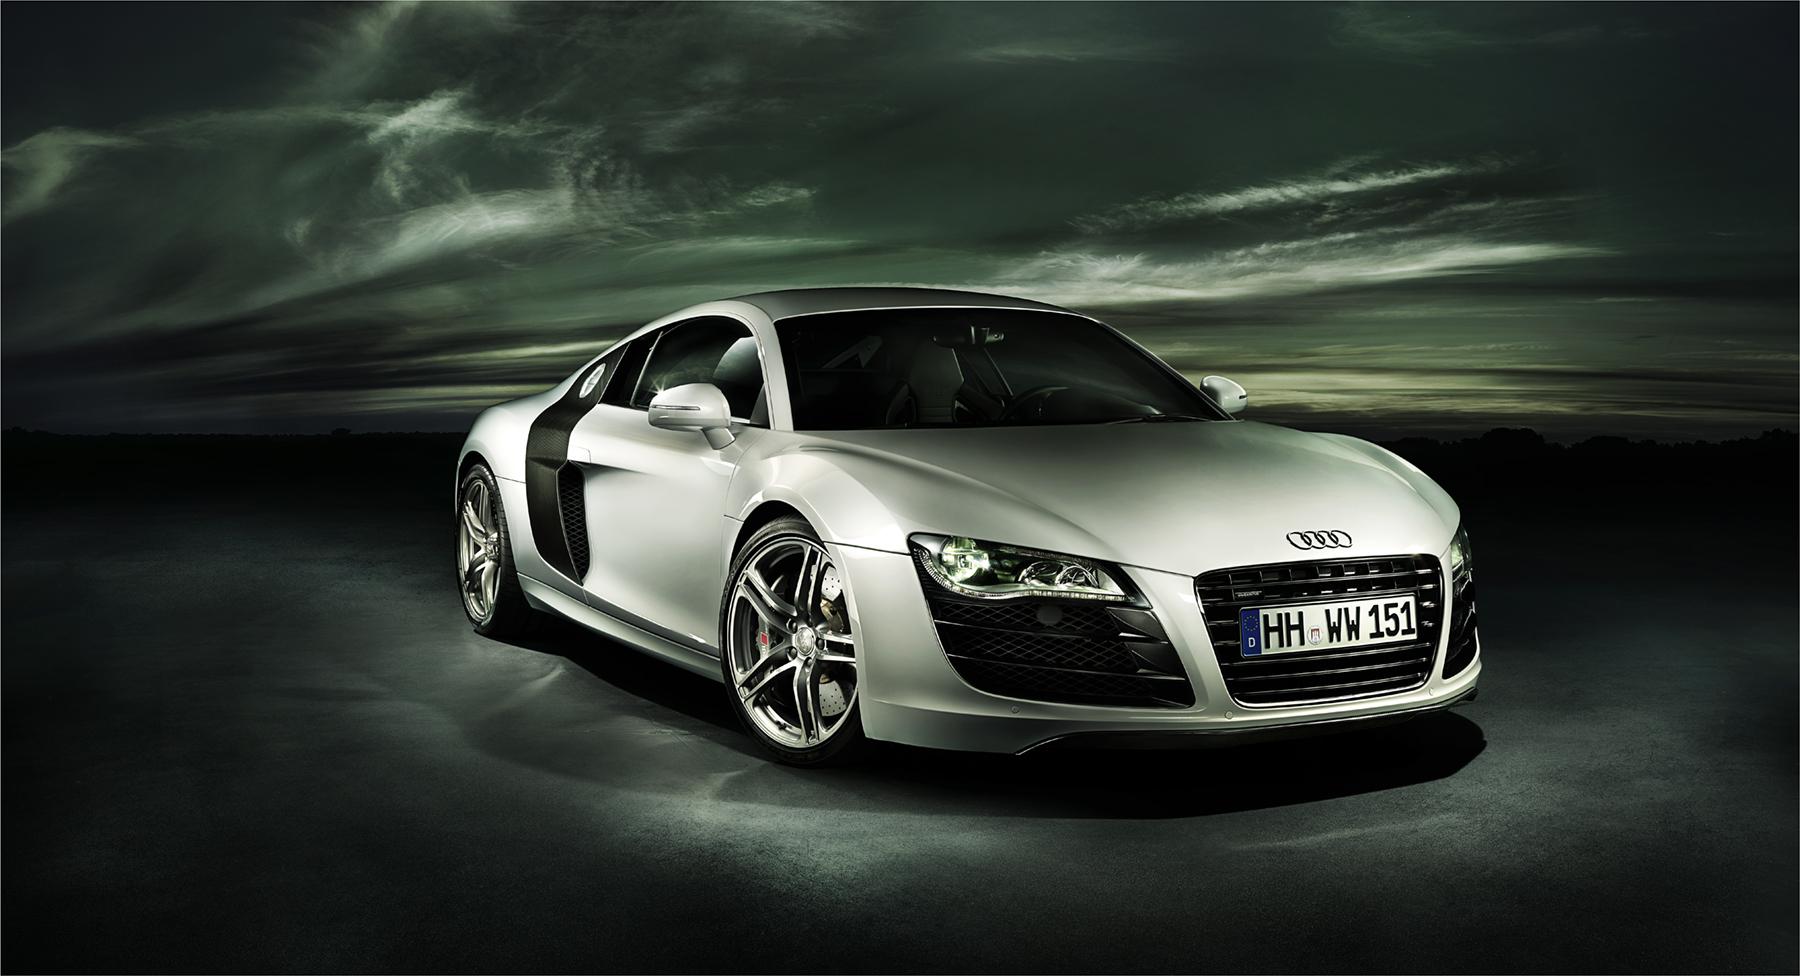 Audi R8 Autofotografie